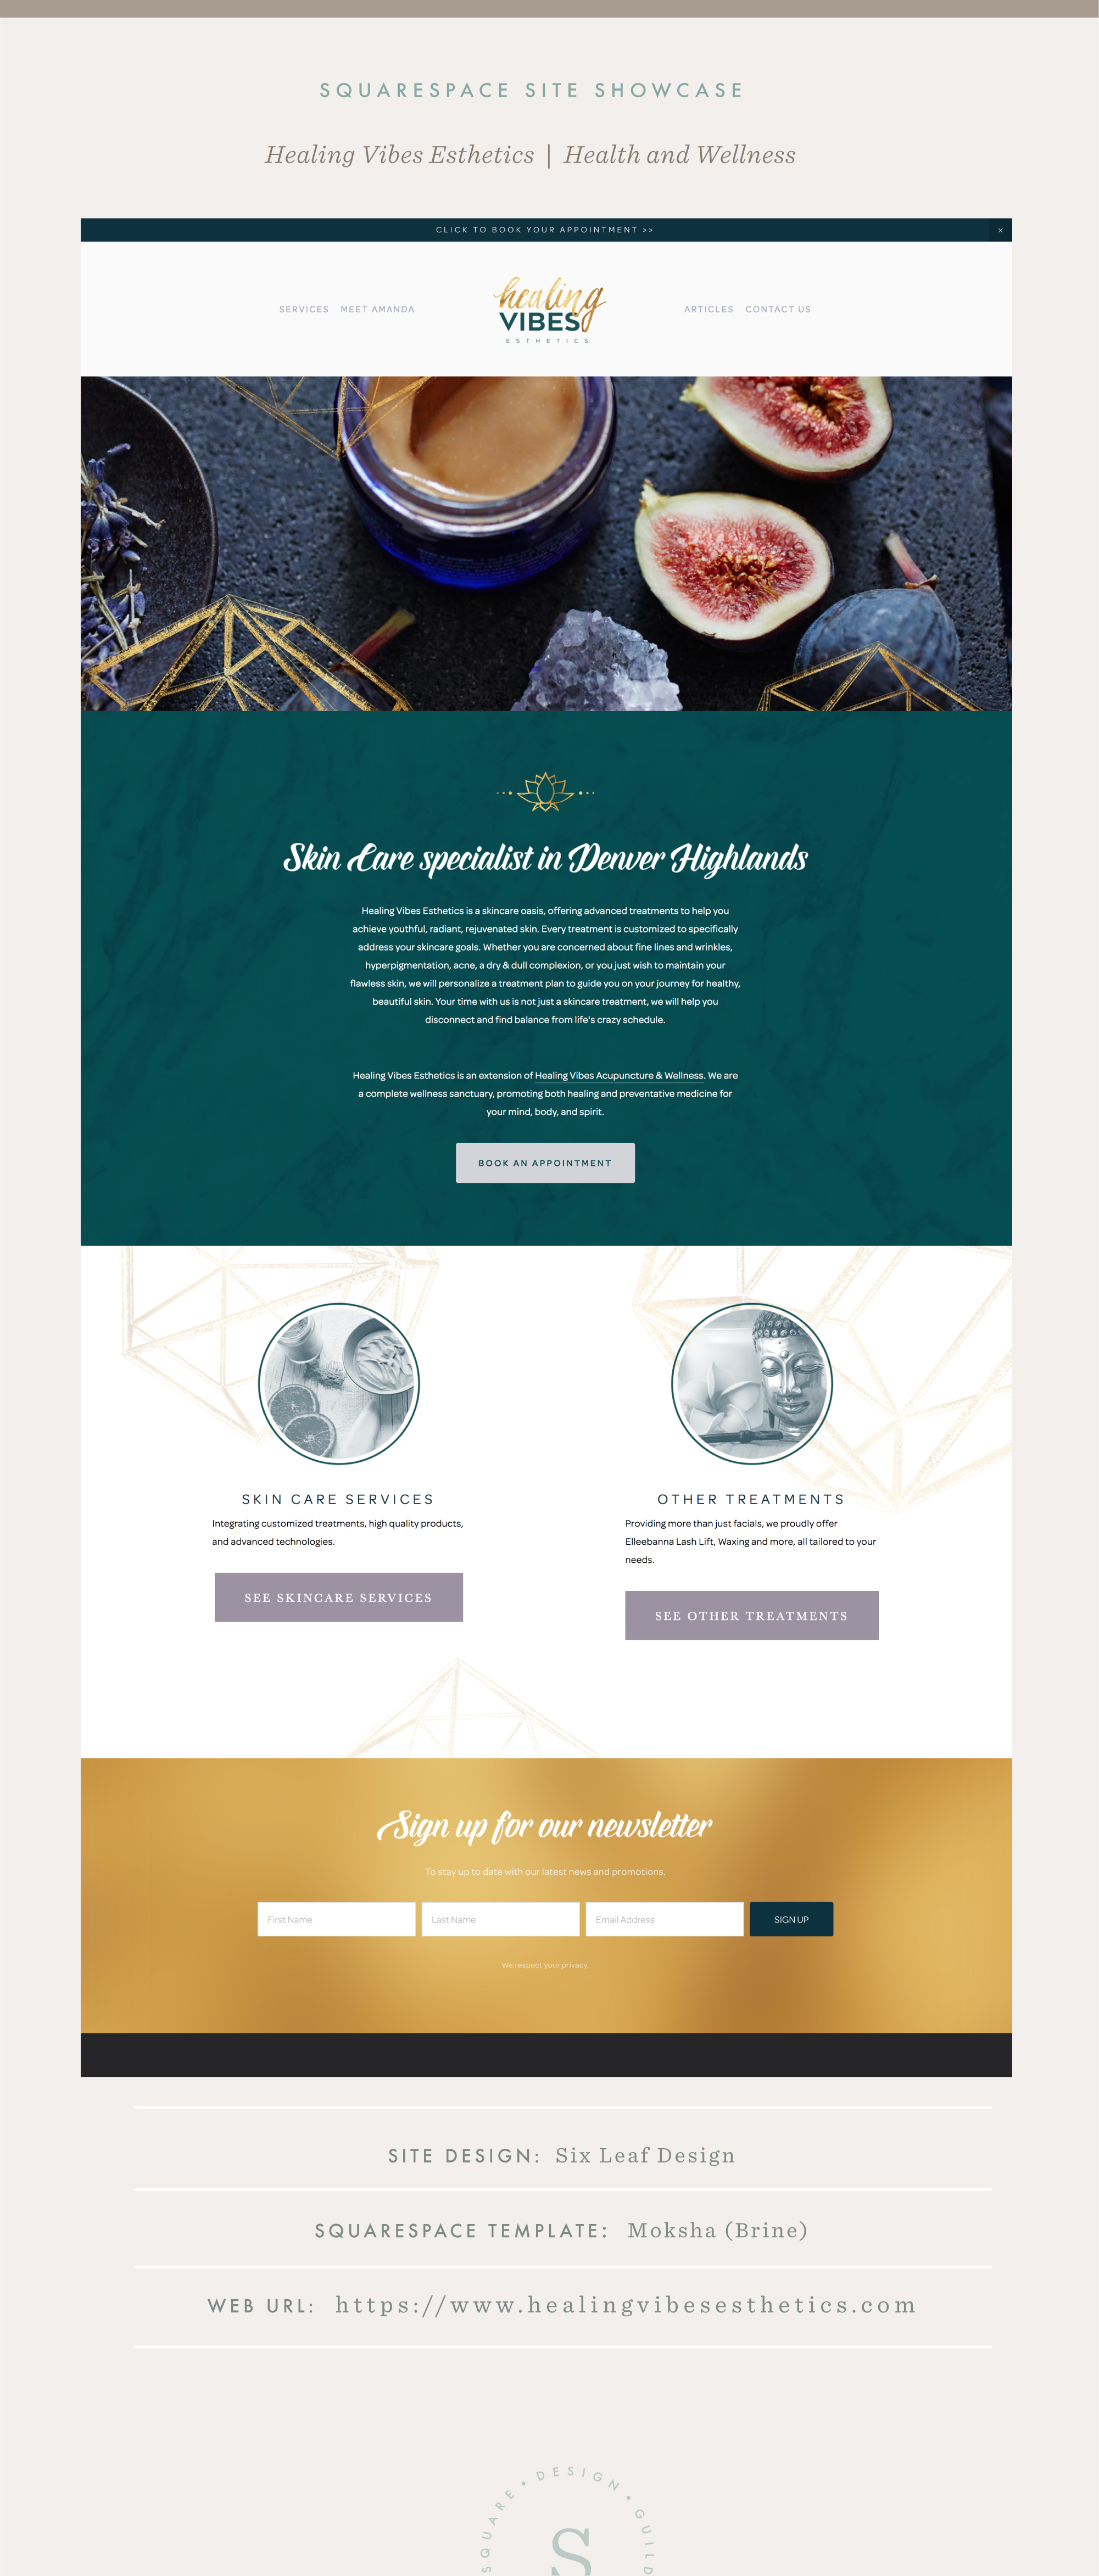 Site Showcase Healing Vibes Esthetics Squarespace Design Guild